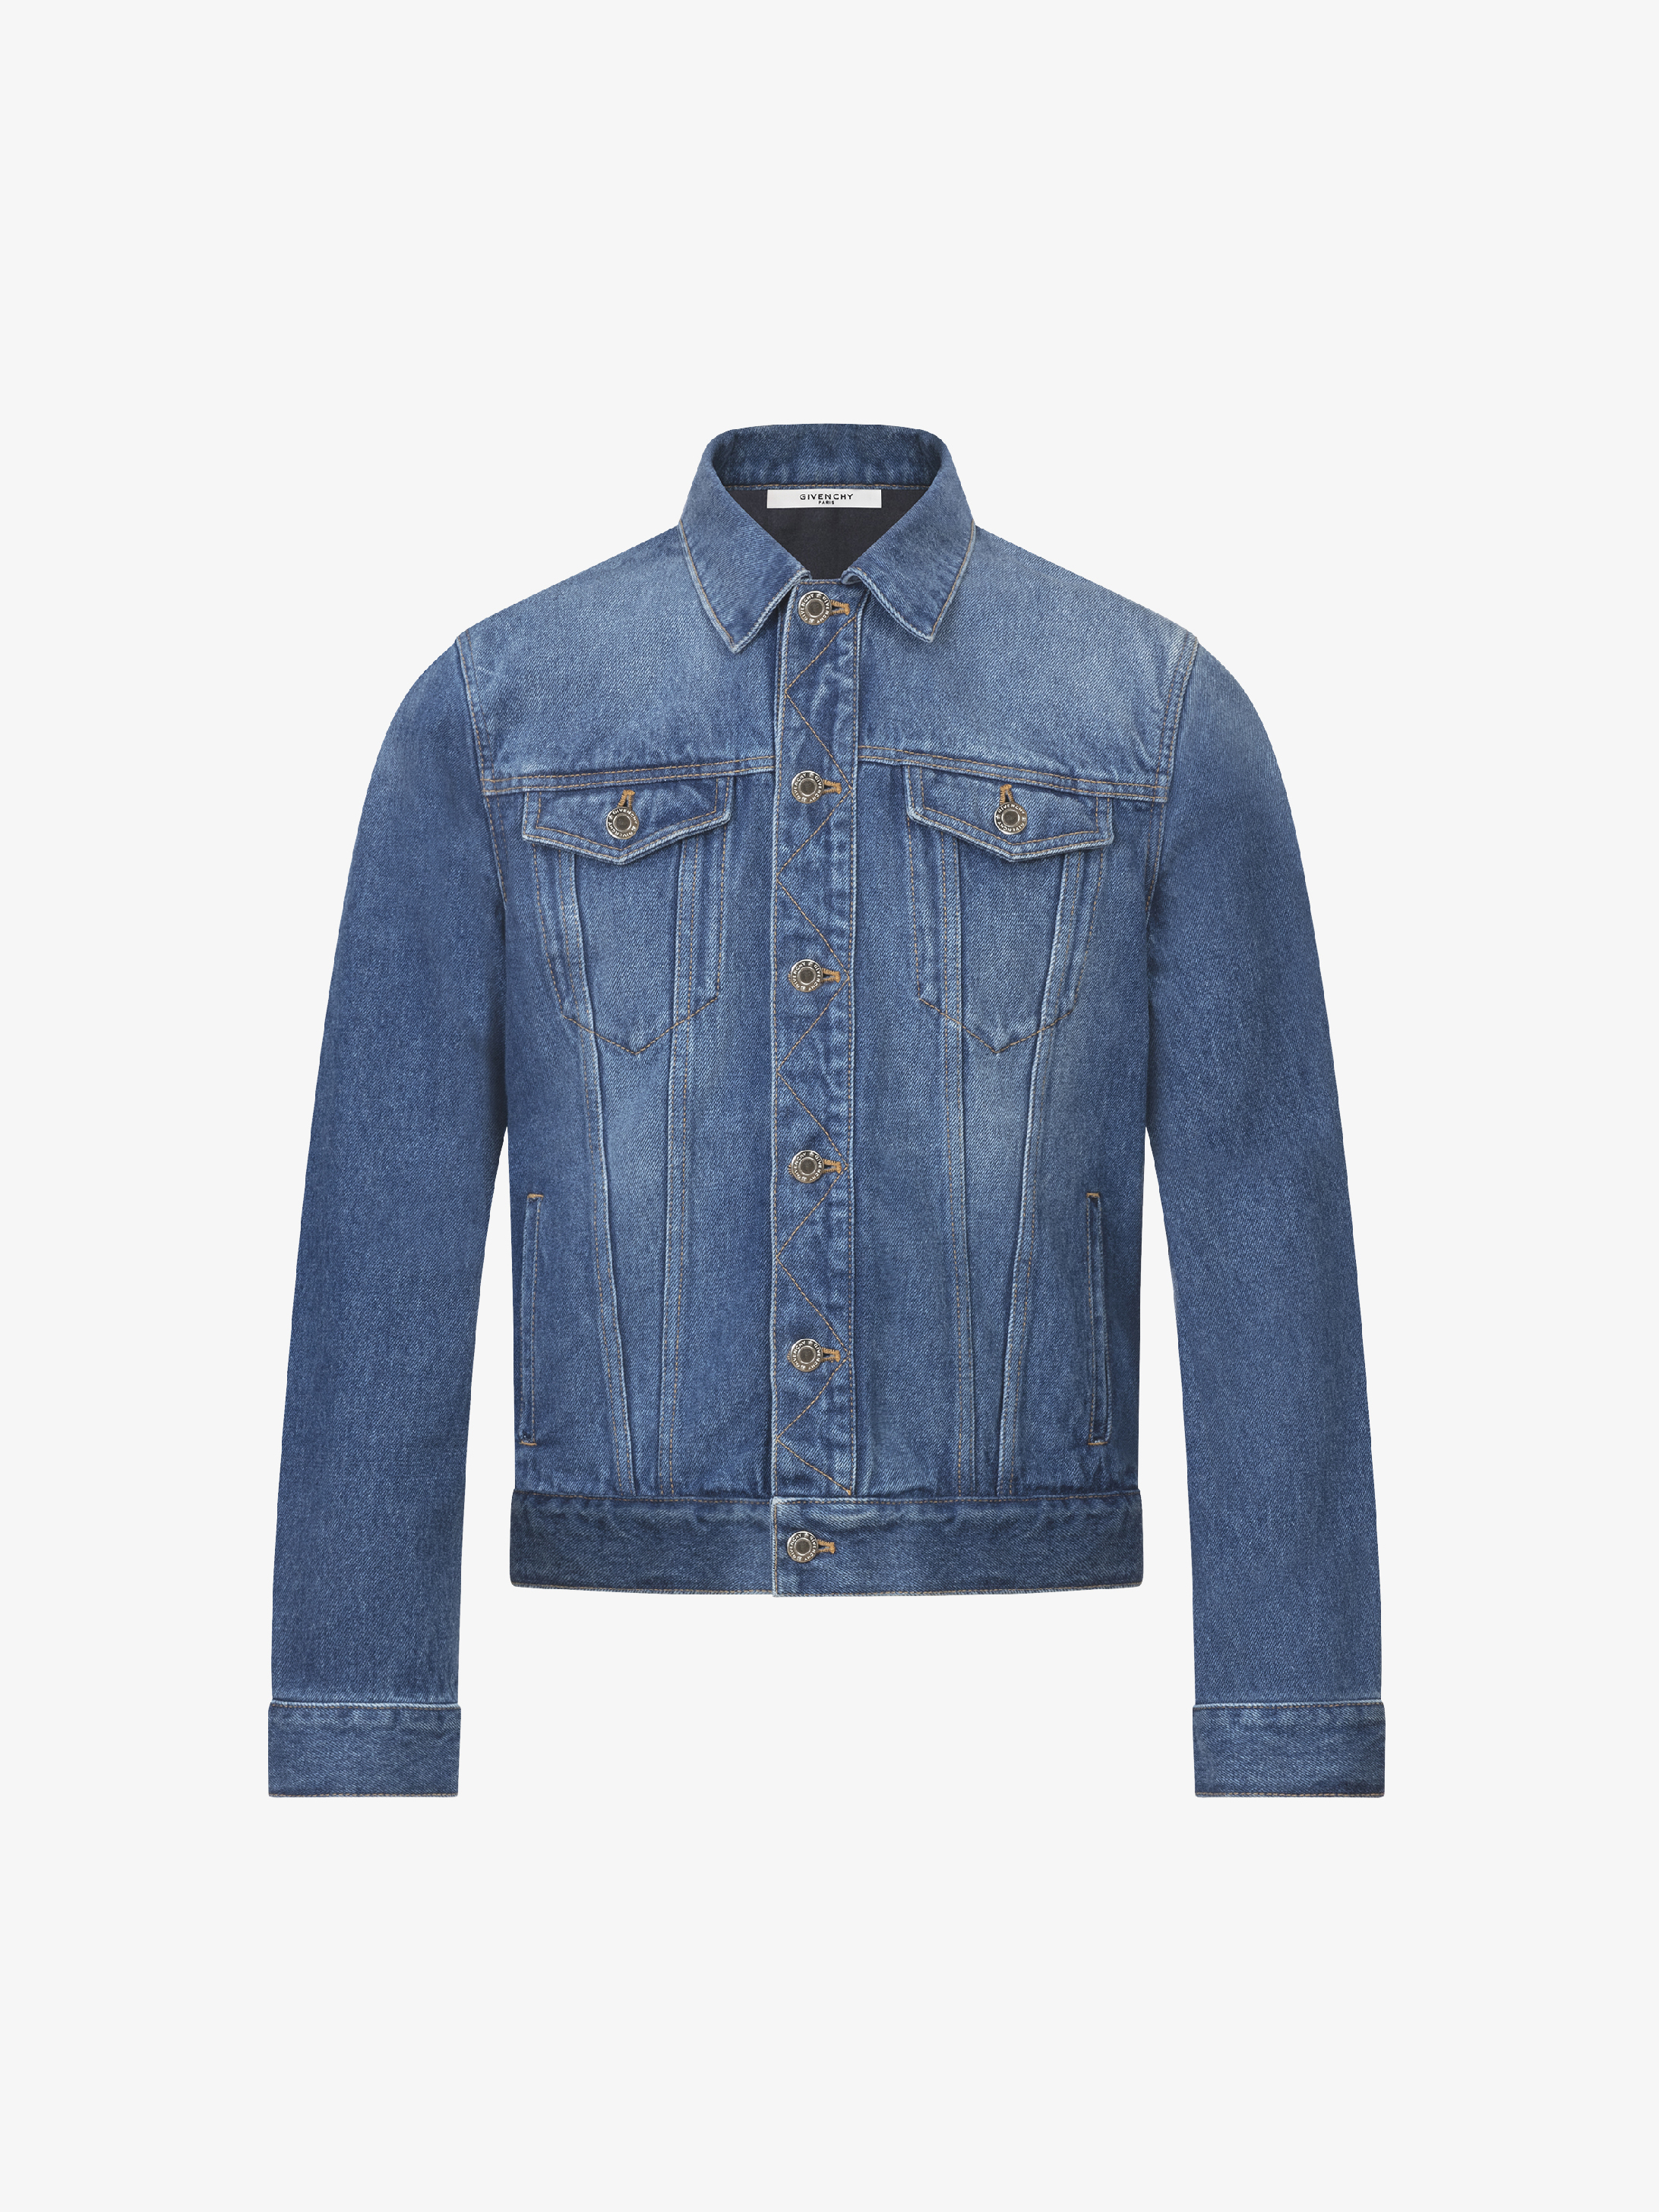 Giubbotto jeans logo GIVENCHY PARIS